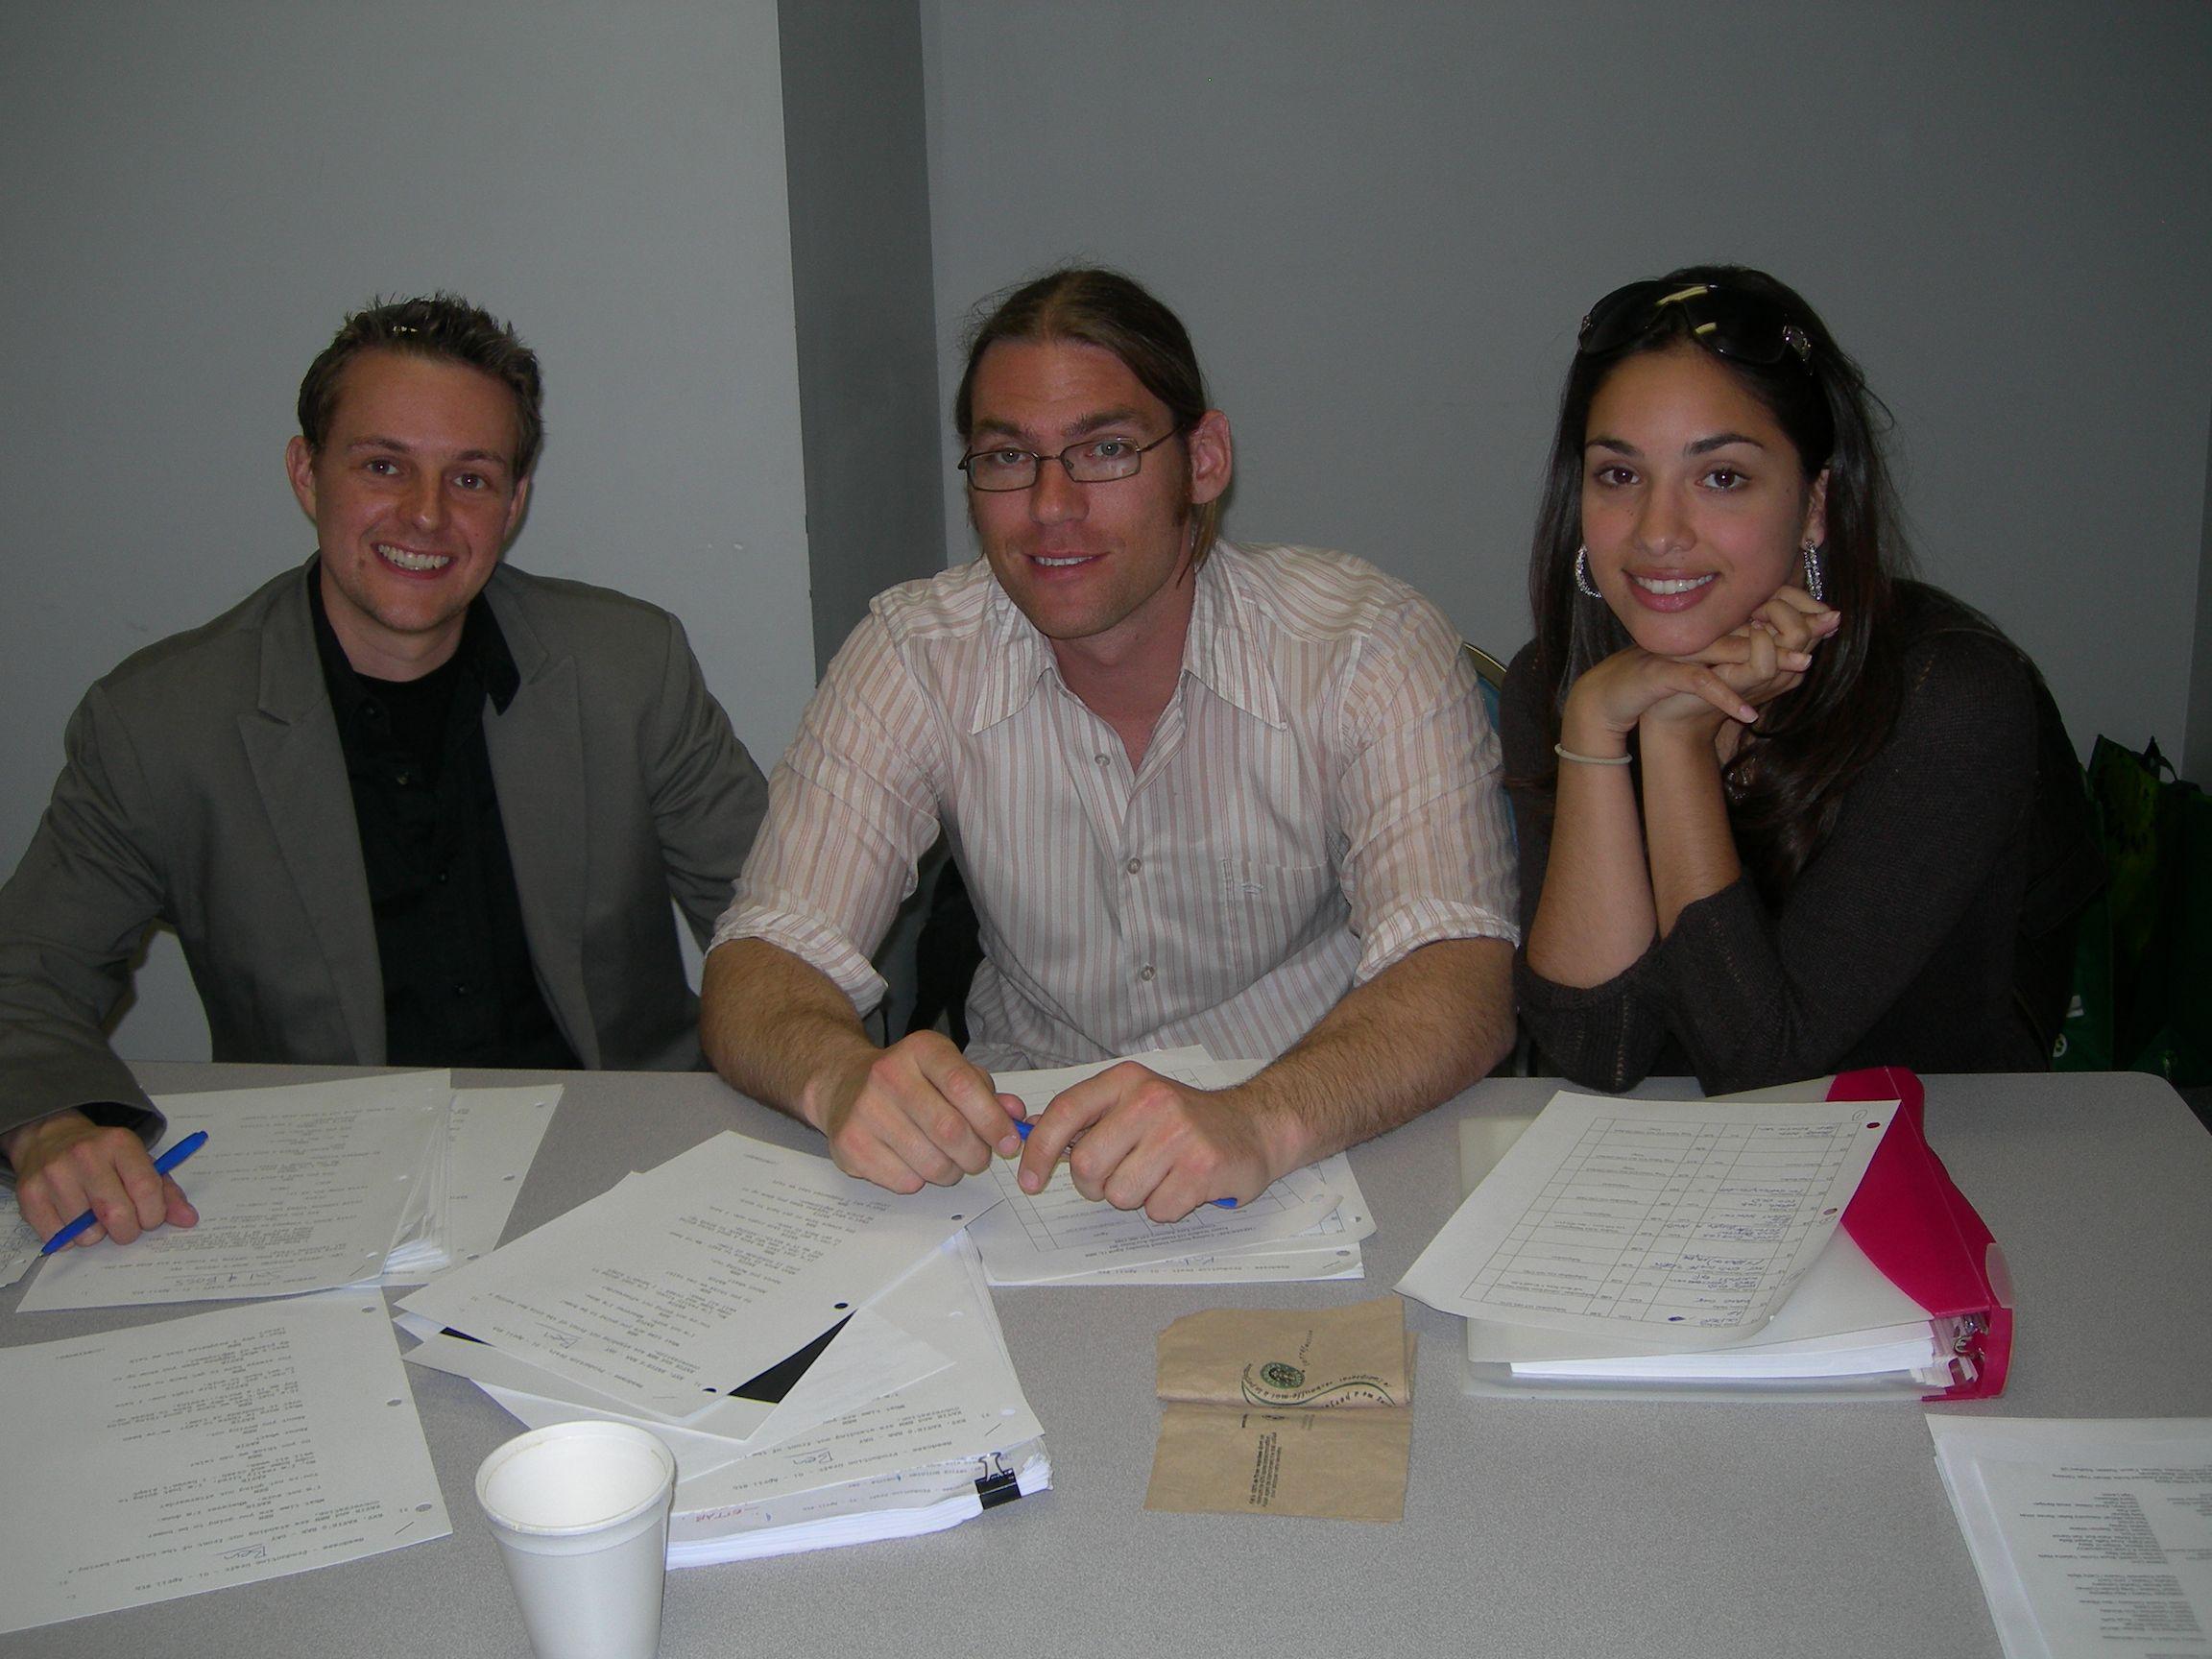 Producer Alex Jordan, Director Ken Simpson & Co-producer Lara Amersey during the casting process